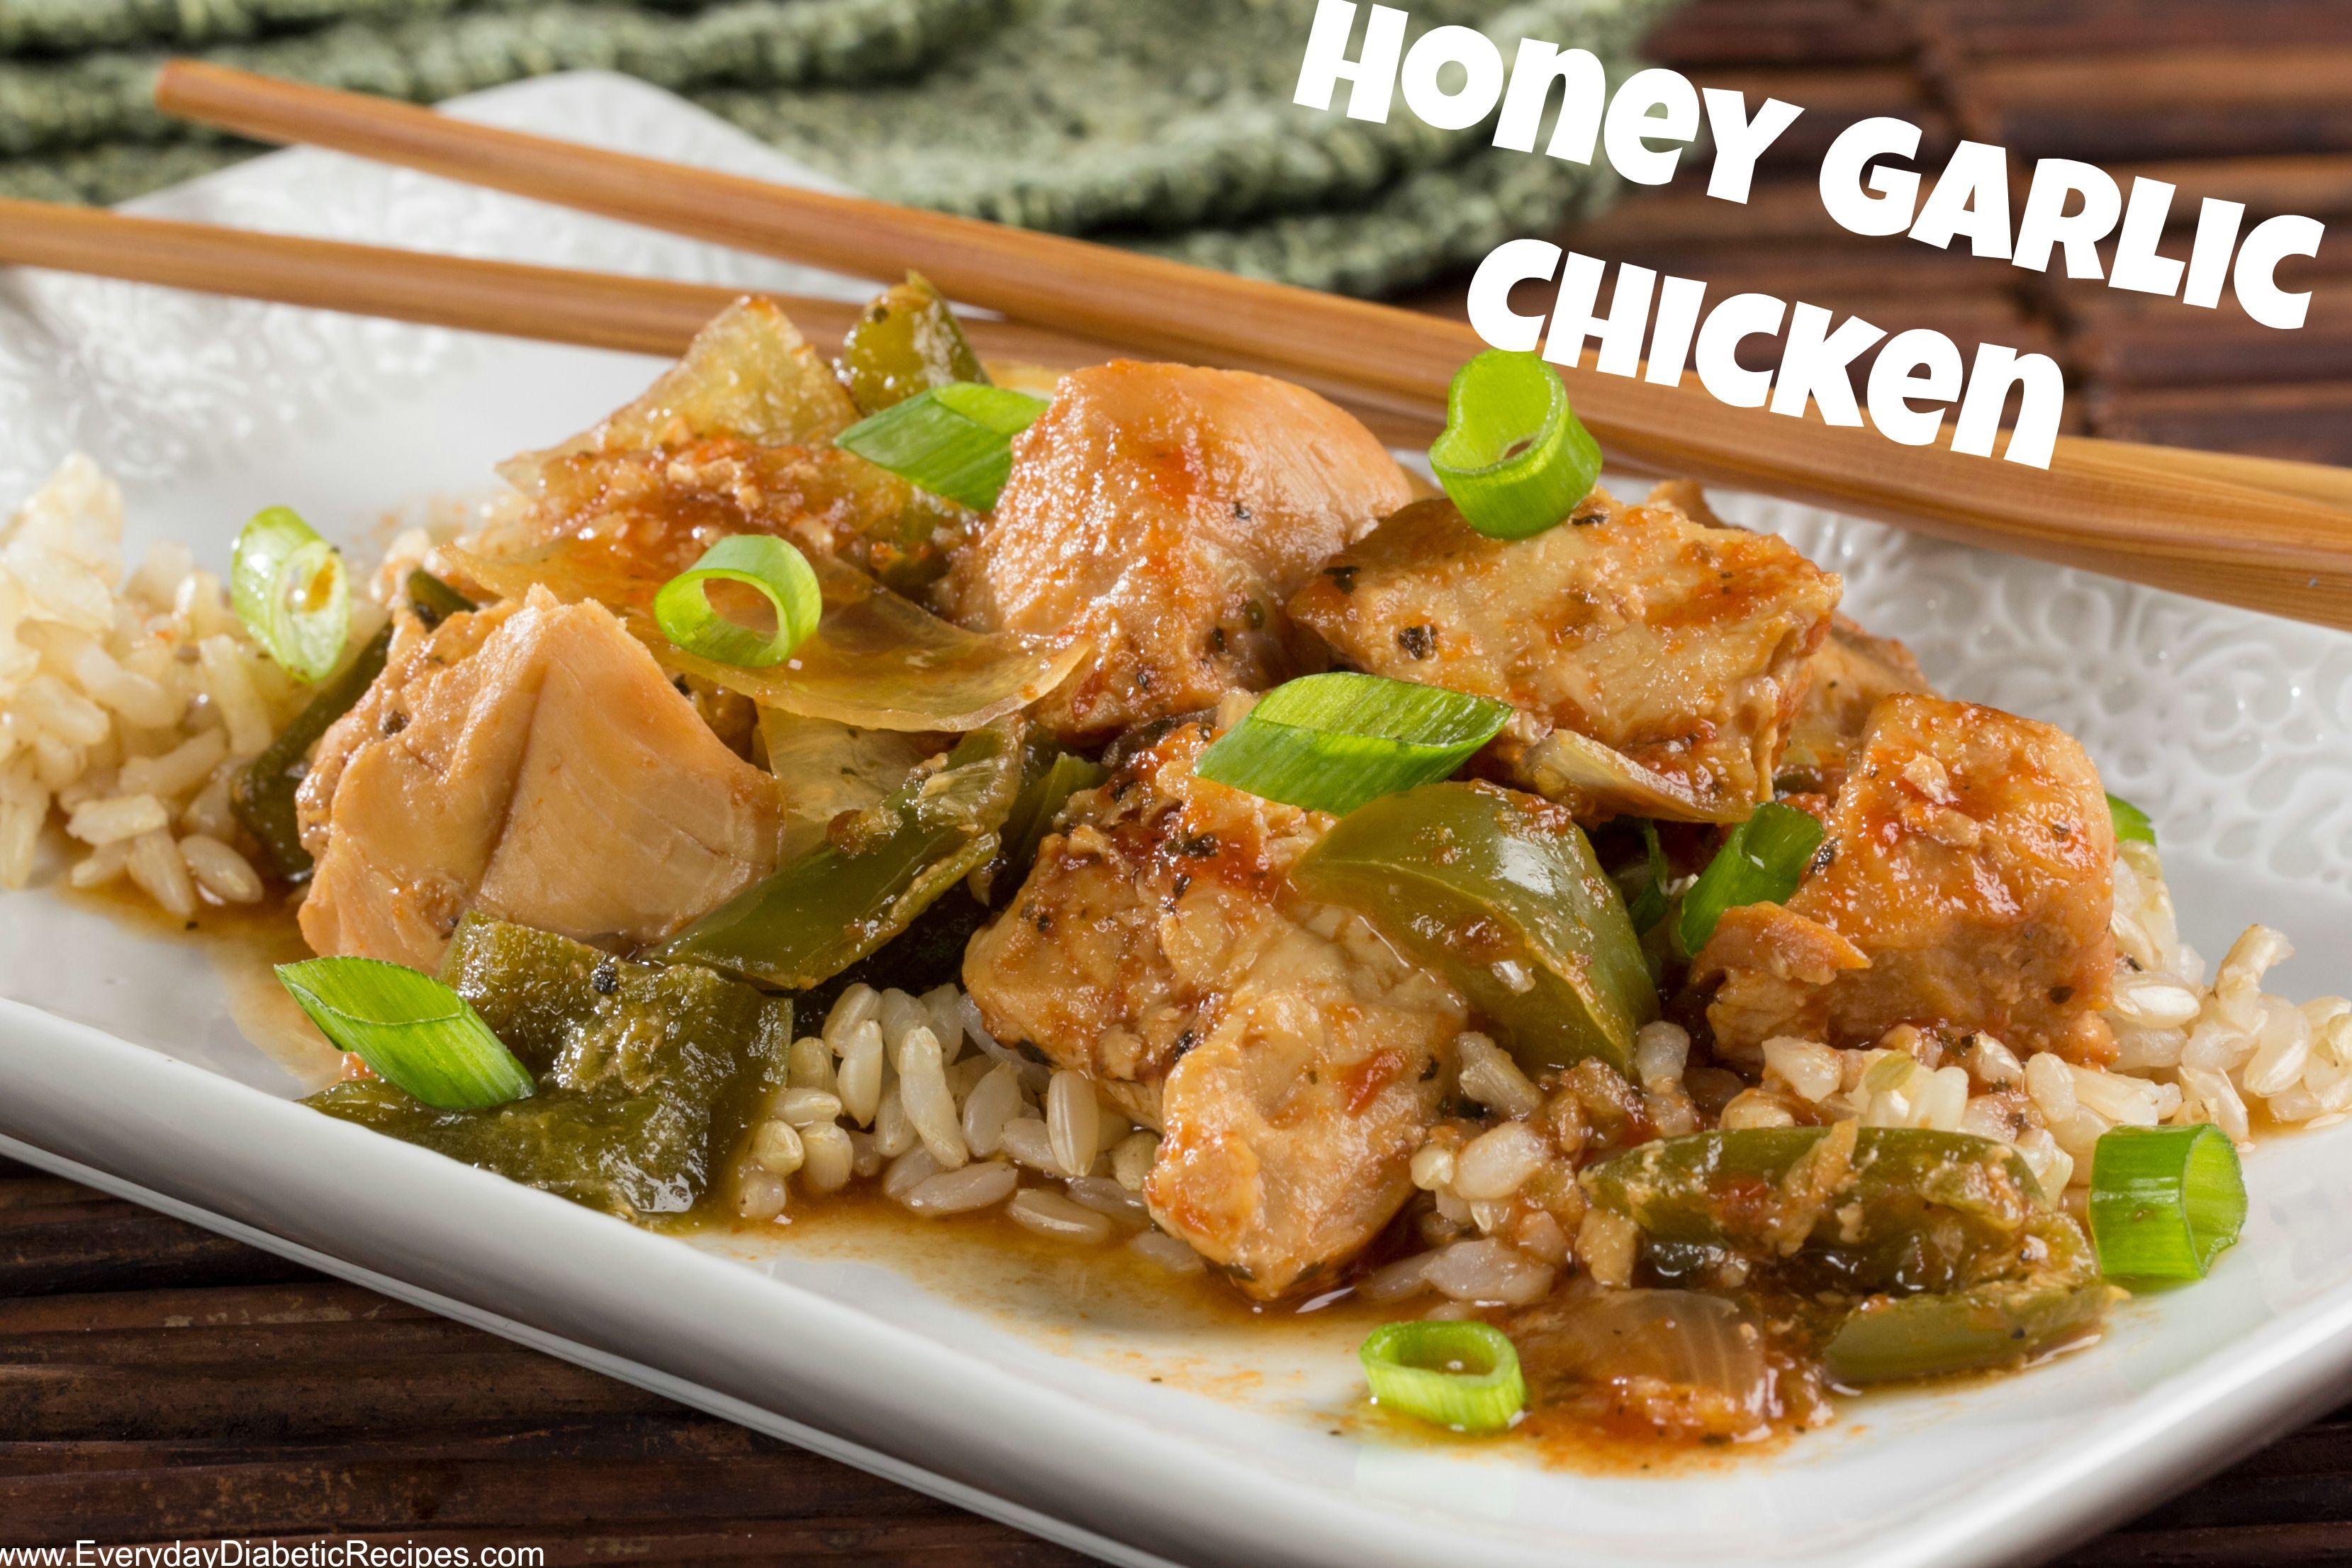 Honey garlic chicken cooker diabetic chicken recipes and diabetic honey garlic chicken chinese food recipesdiabetic forumfinder Choice Image